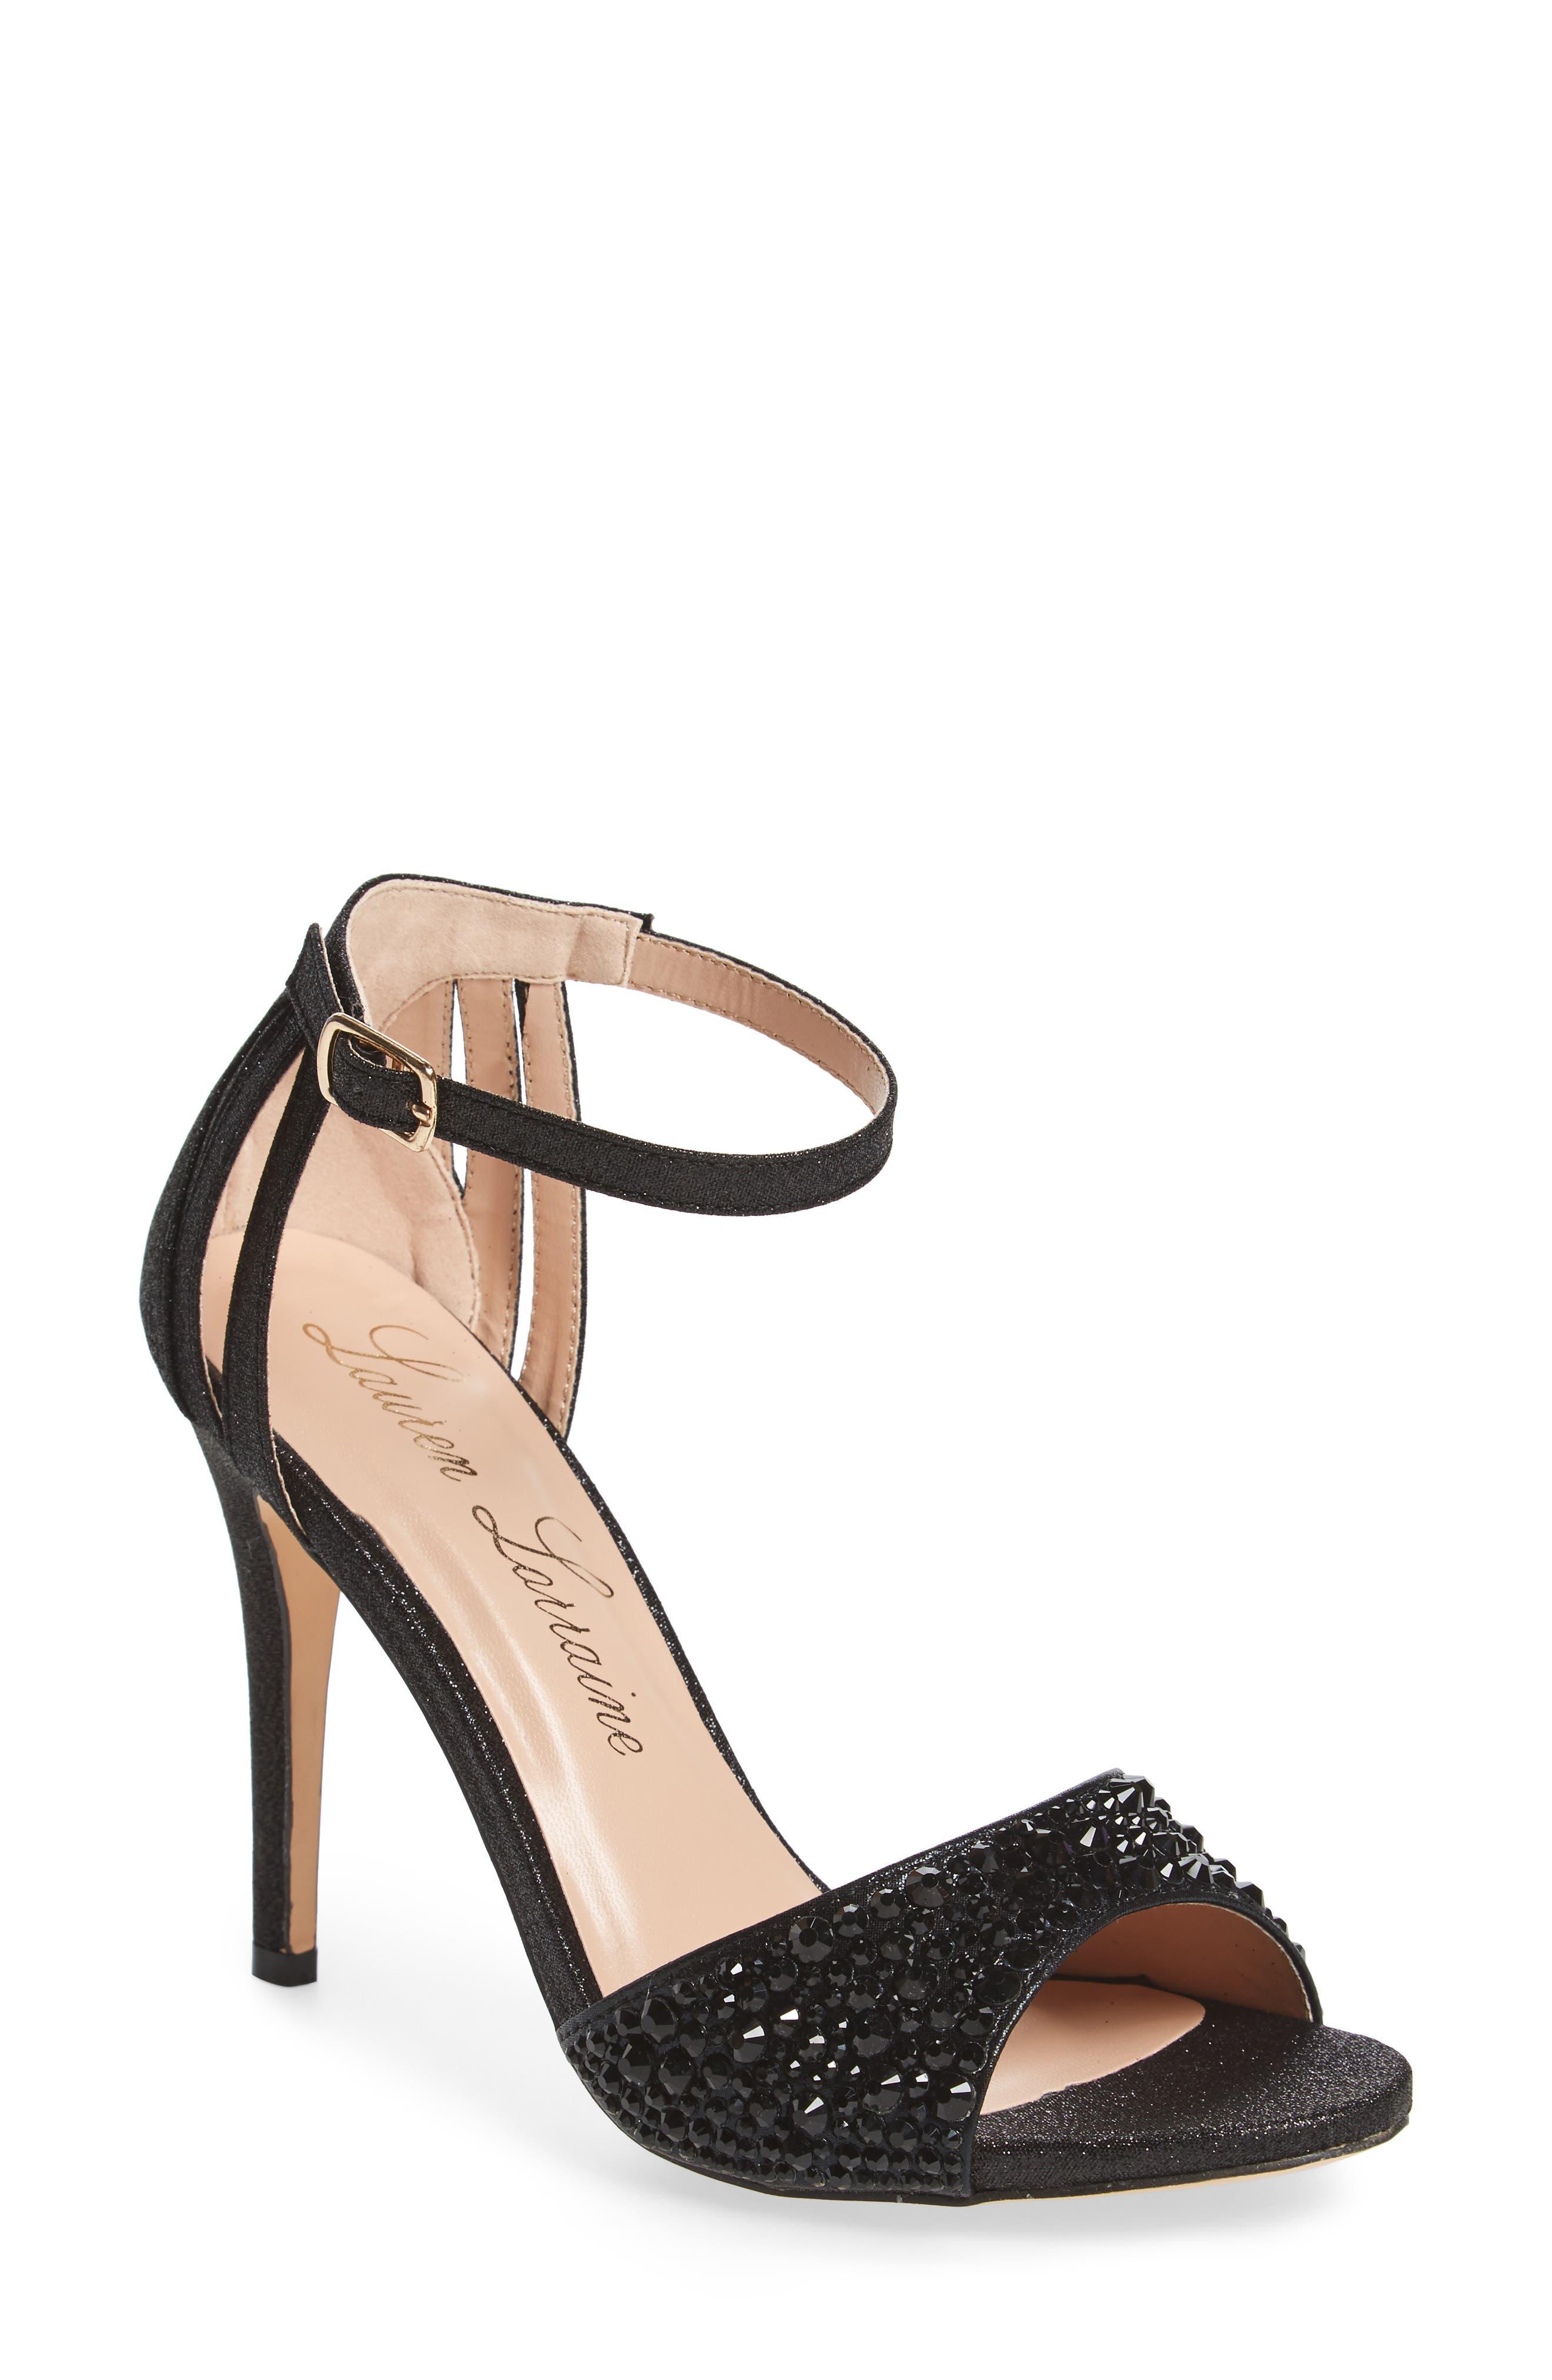 Alternate Image 1 Selected - Lauren Lorraine Maddy Embellished Sandal (Women)